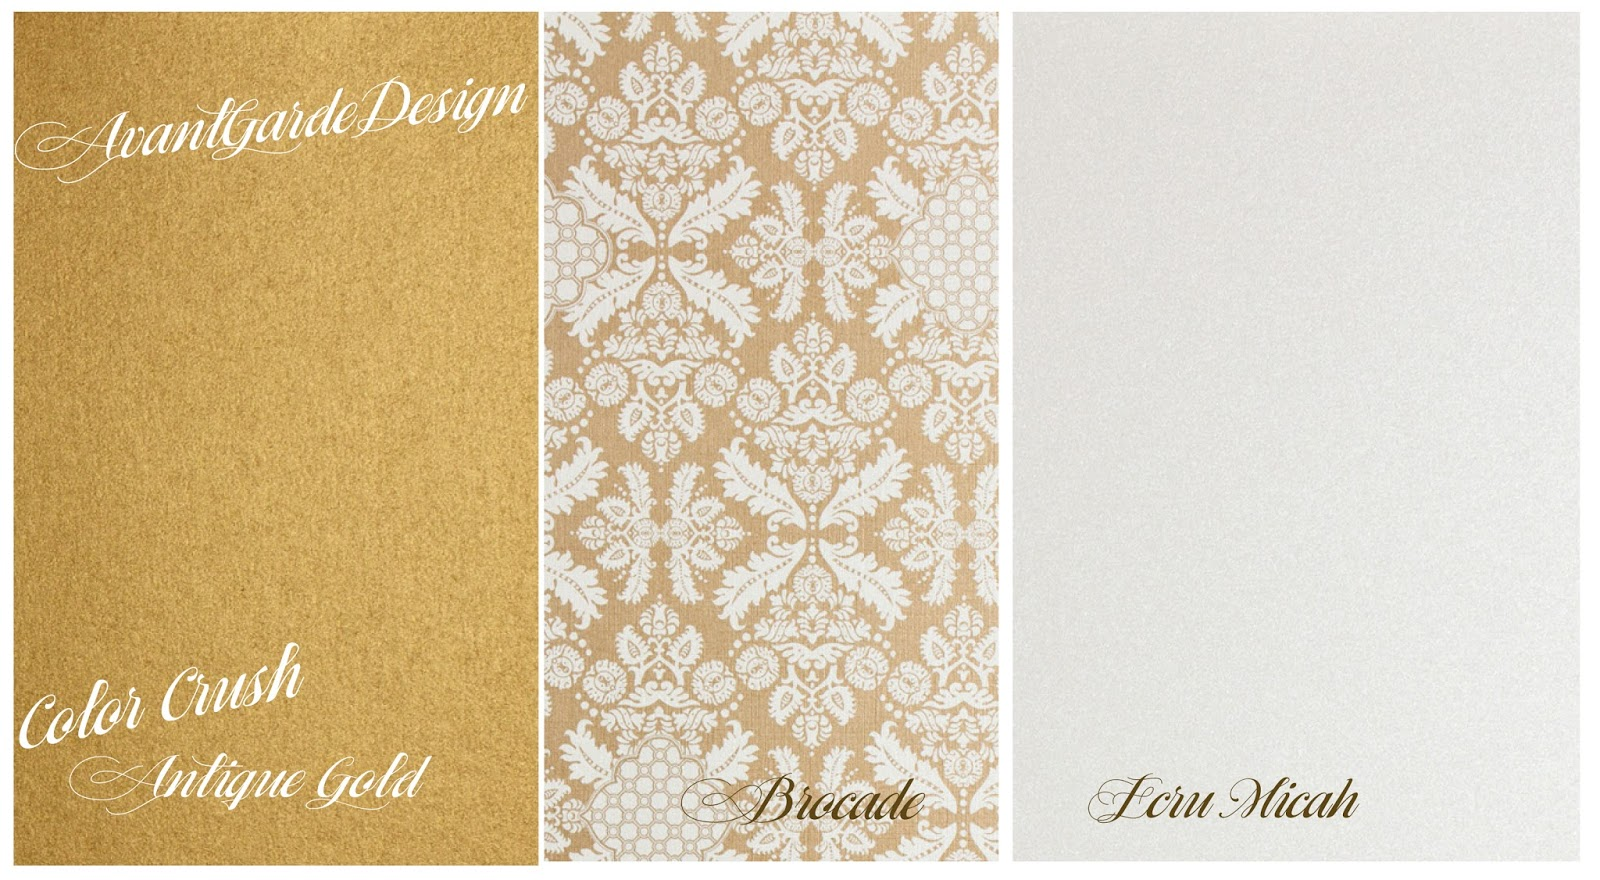 AvantGarde Design - Graphic Design & Print Company in Connecticut ...